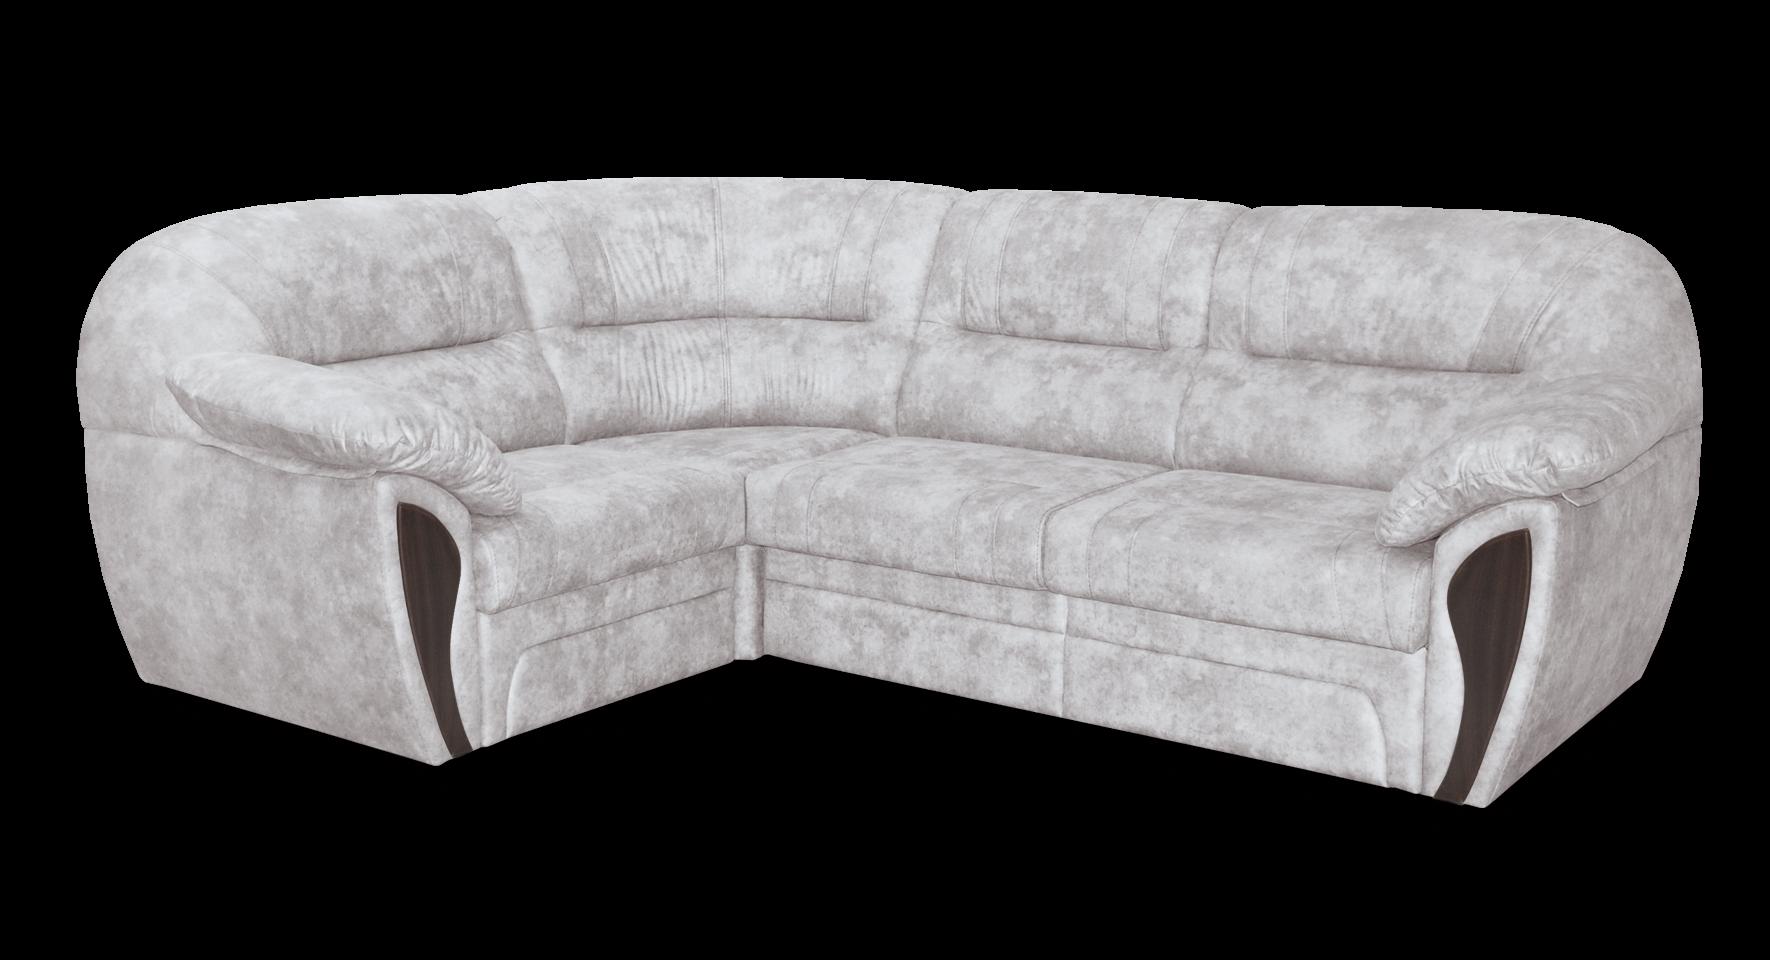 Угловой диван мягкий Лаура